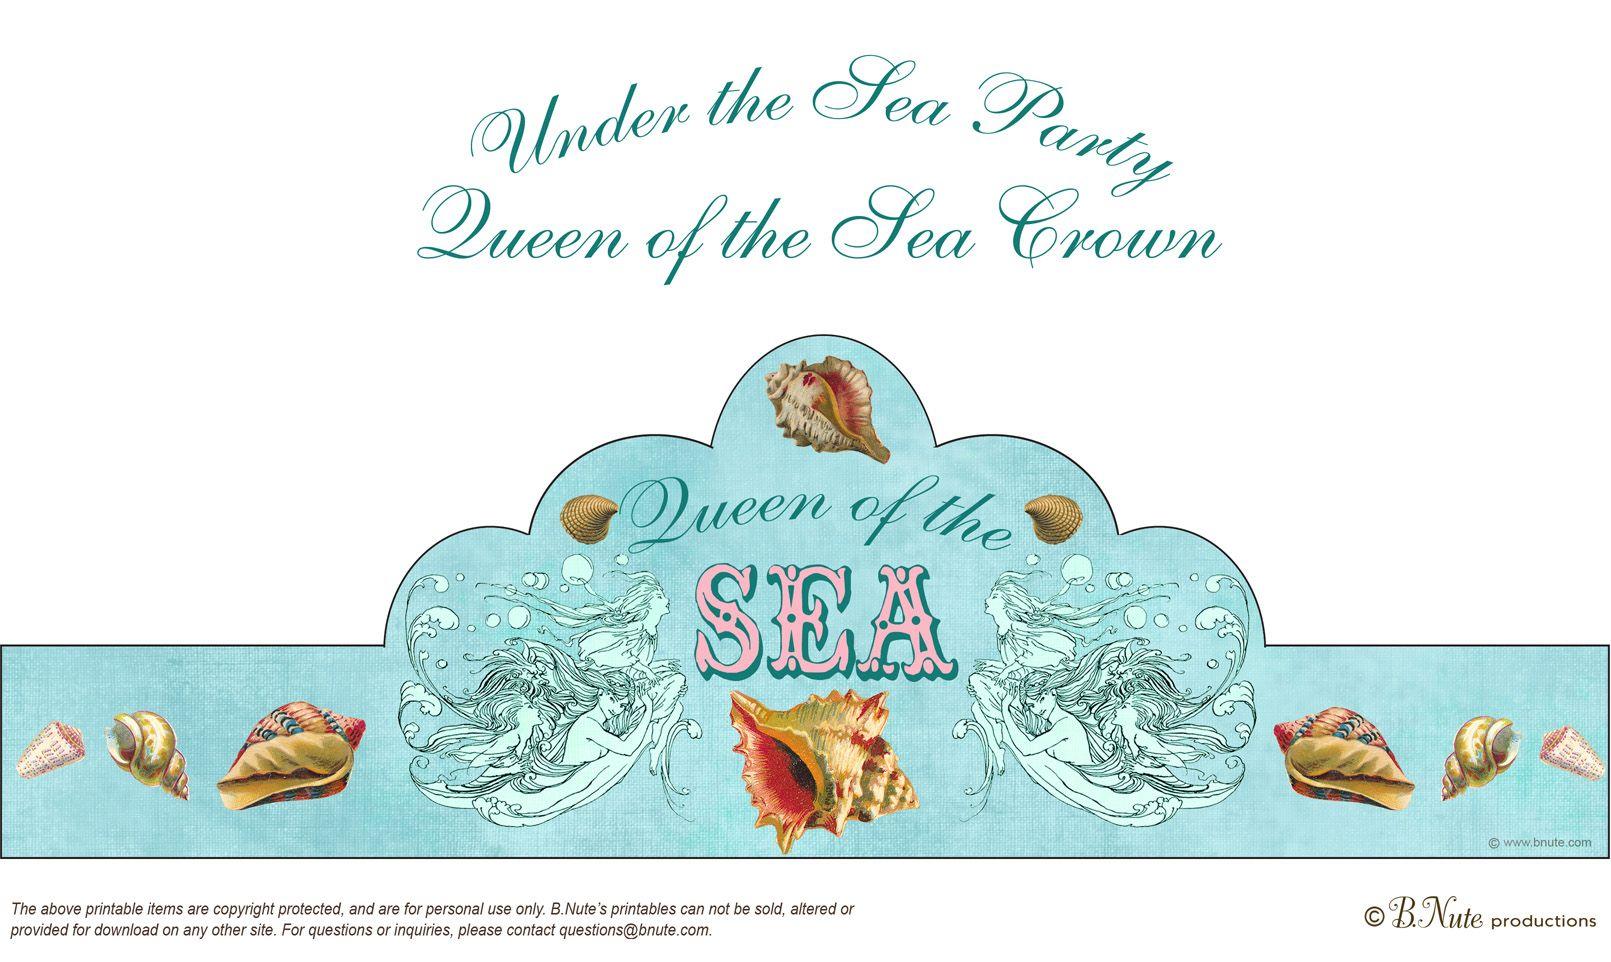 best images about mermaid party printable disney 17 best images about mermaid party printable disney ariel and mermaid crown